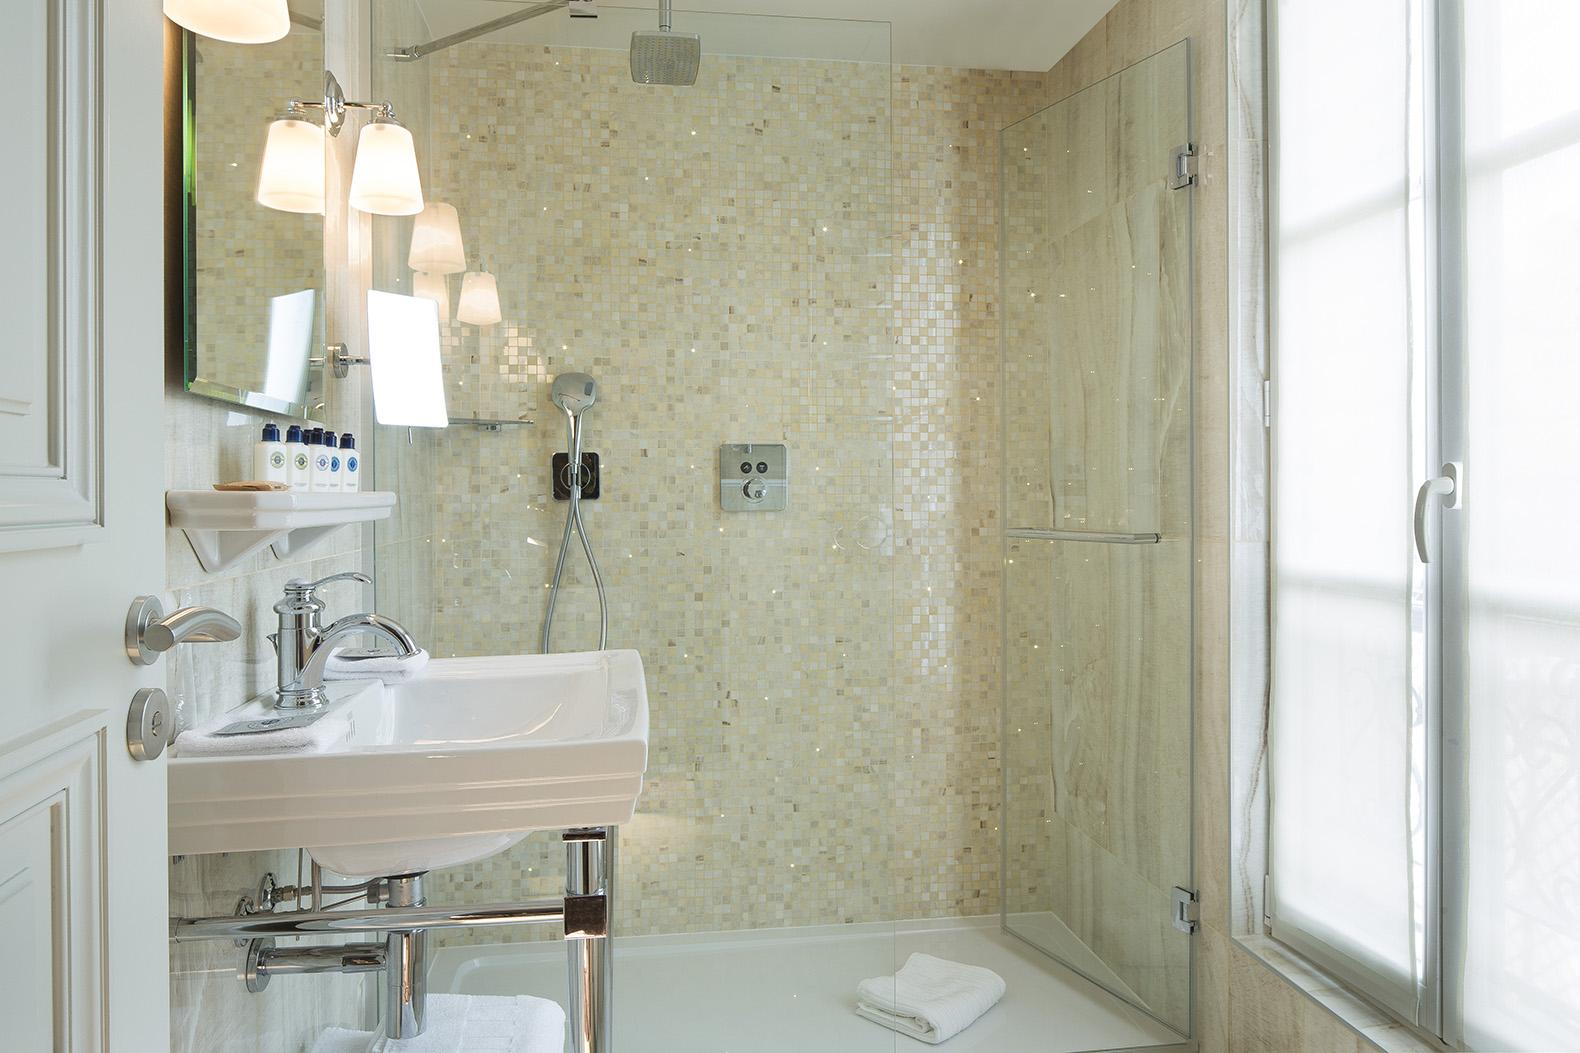 Salle de bain Hotel Monge